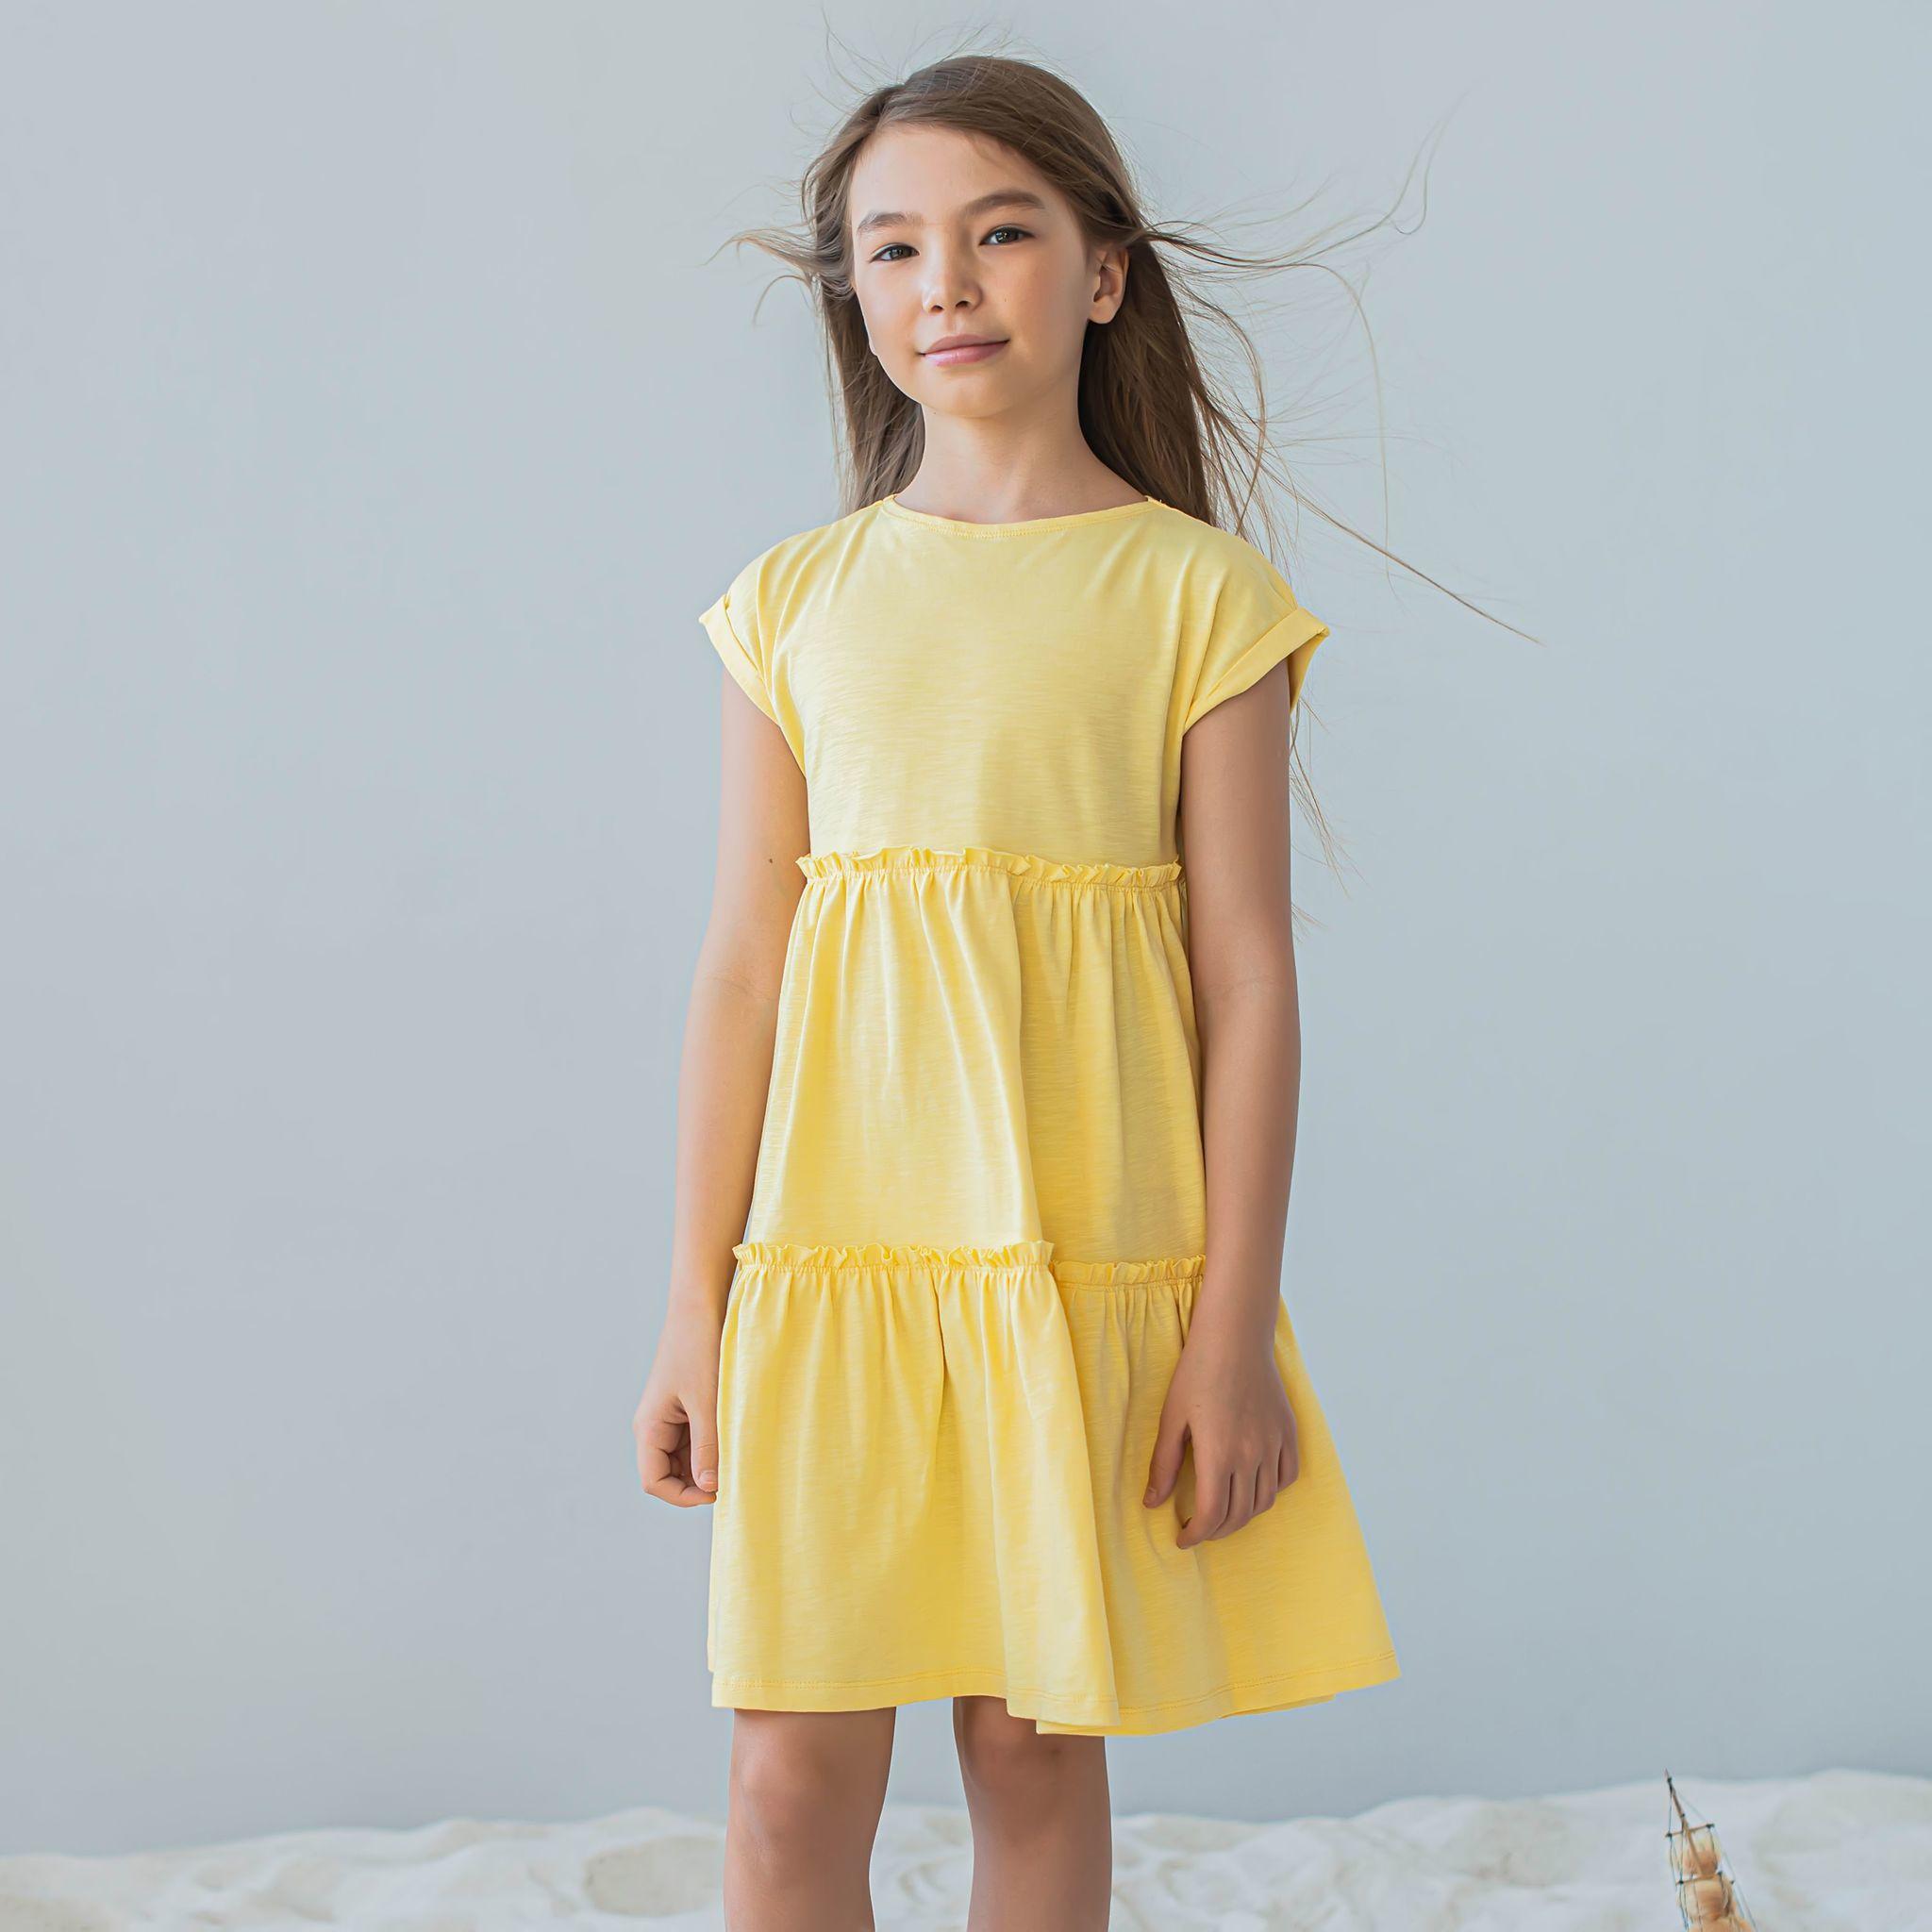 Dress with flounce for teens - Daffodil